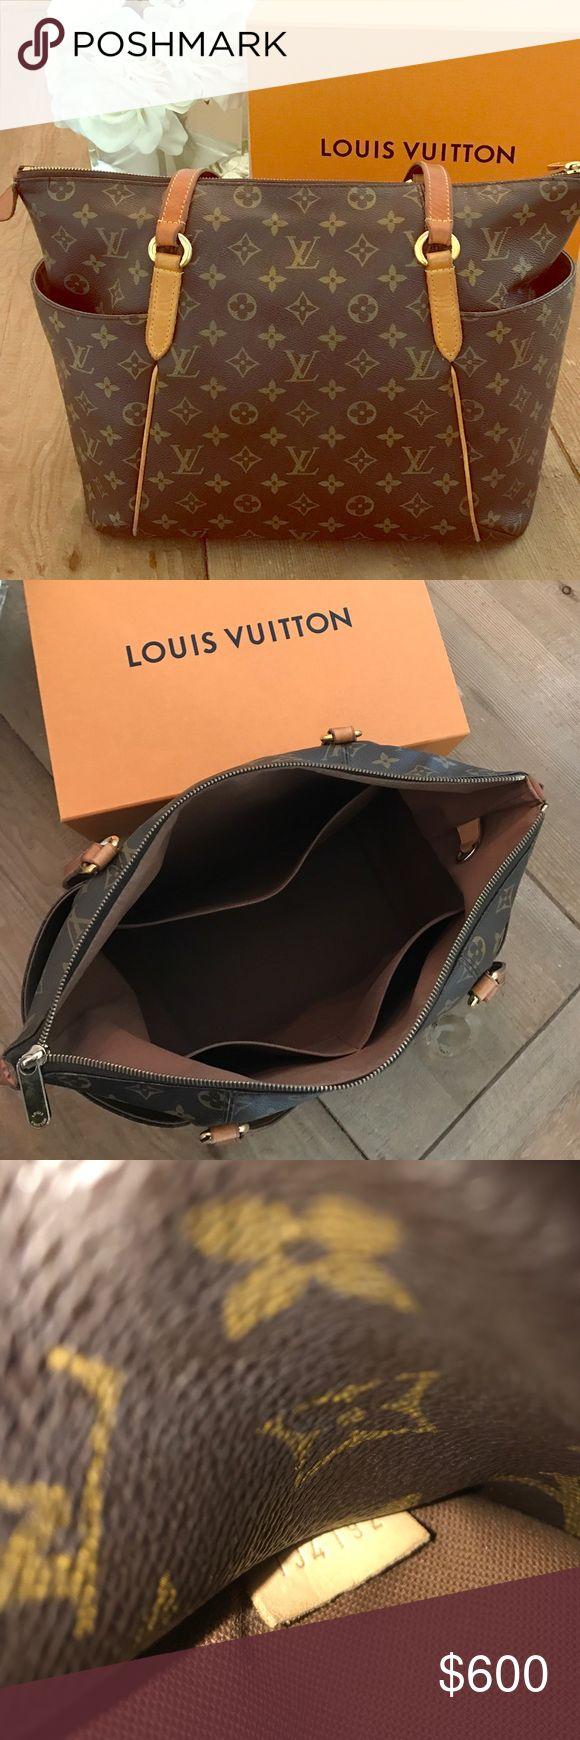 Totally PM Louis Vuitton authentic shoulder bag Authentic Louis Vuitton 'Totally PM' handbag. 13.8x9.4x5.5 Louis Vuitton Bags Shoulder Bags